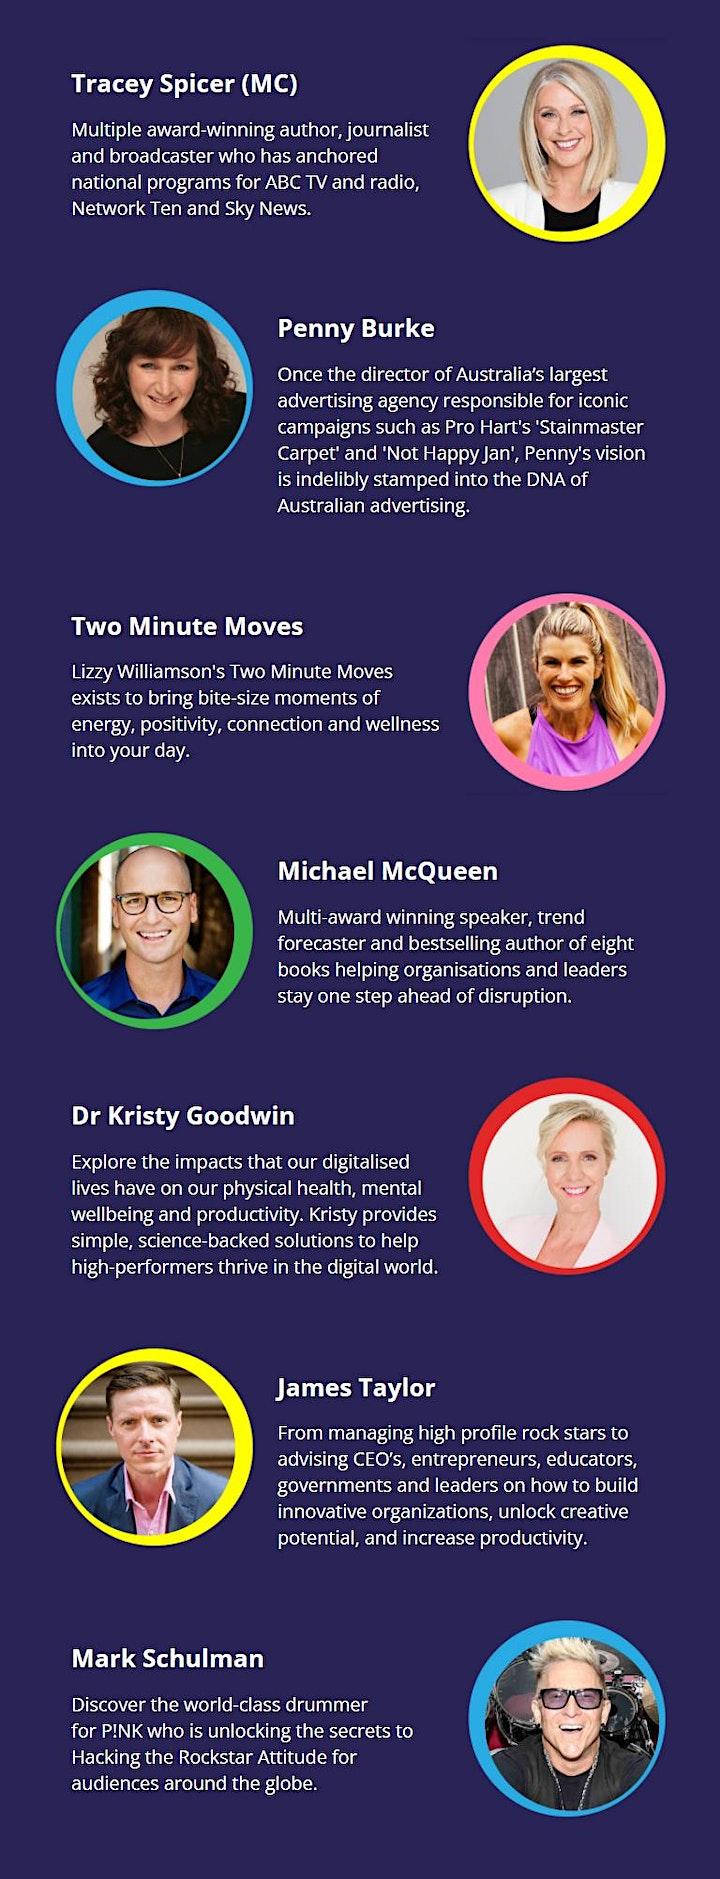 Ovations Online Global Speaker Showcase 2021 image